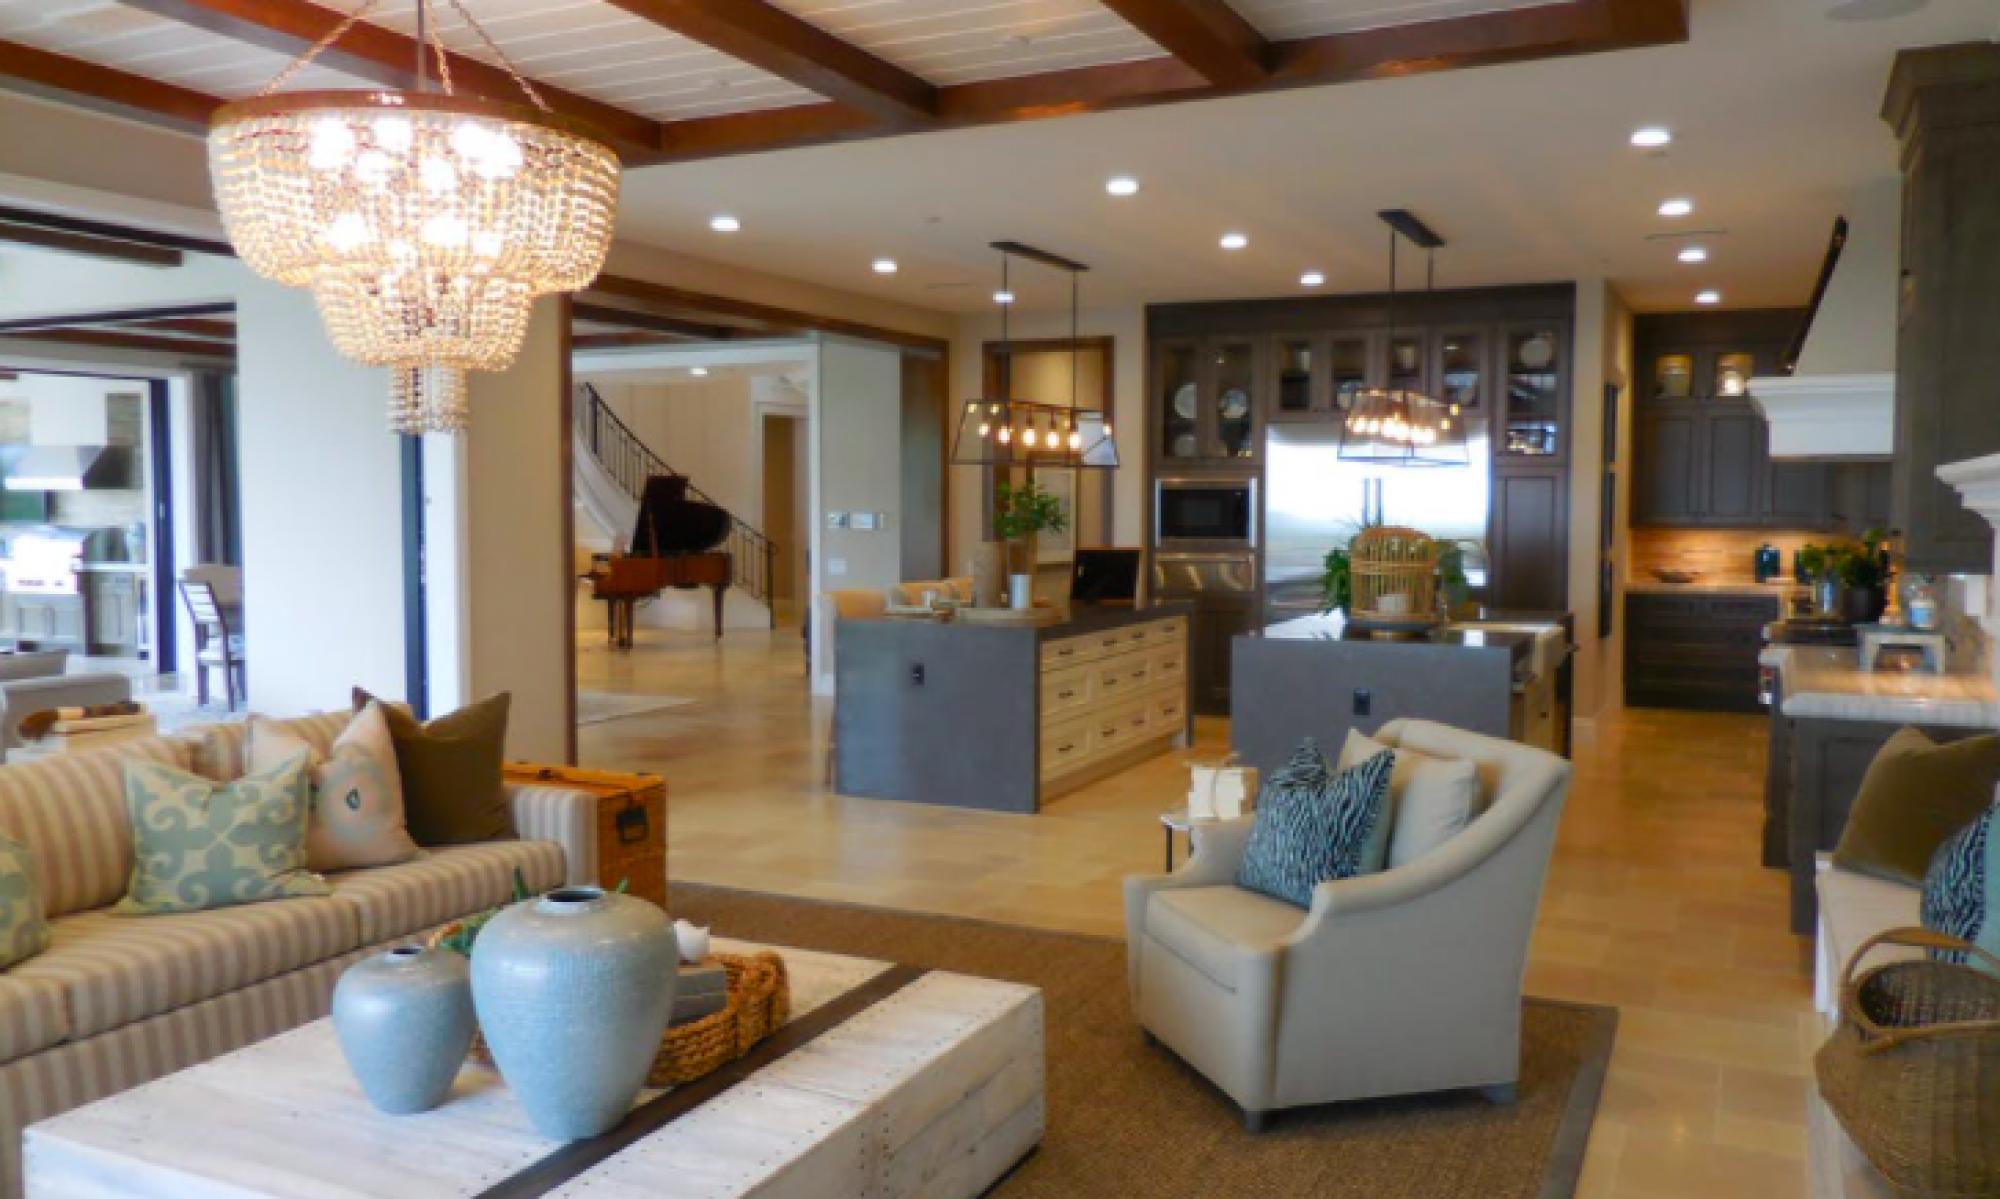 Home Builders of Joco Home Improvement News